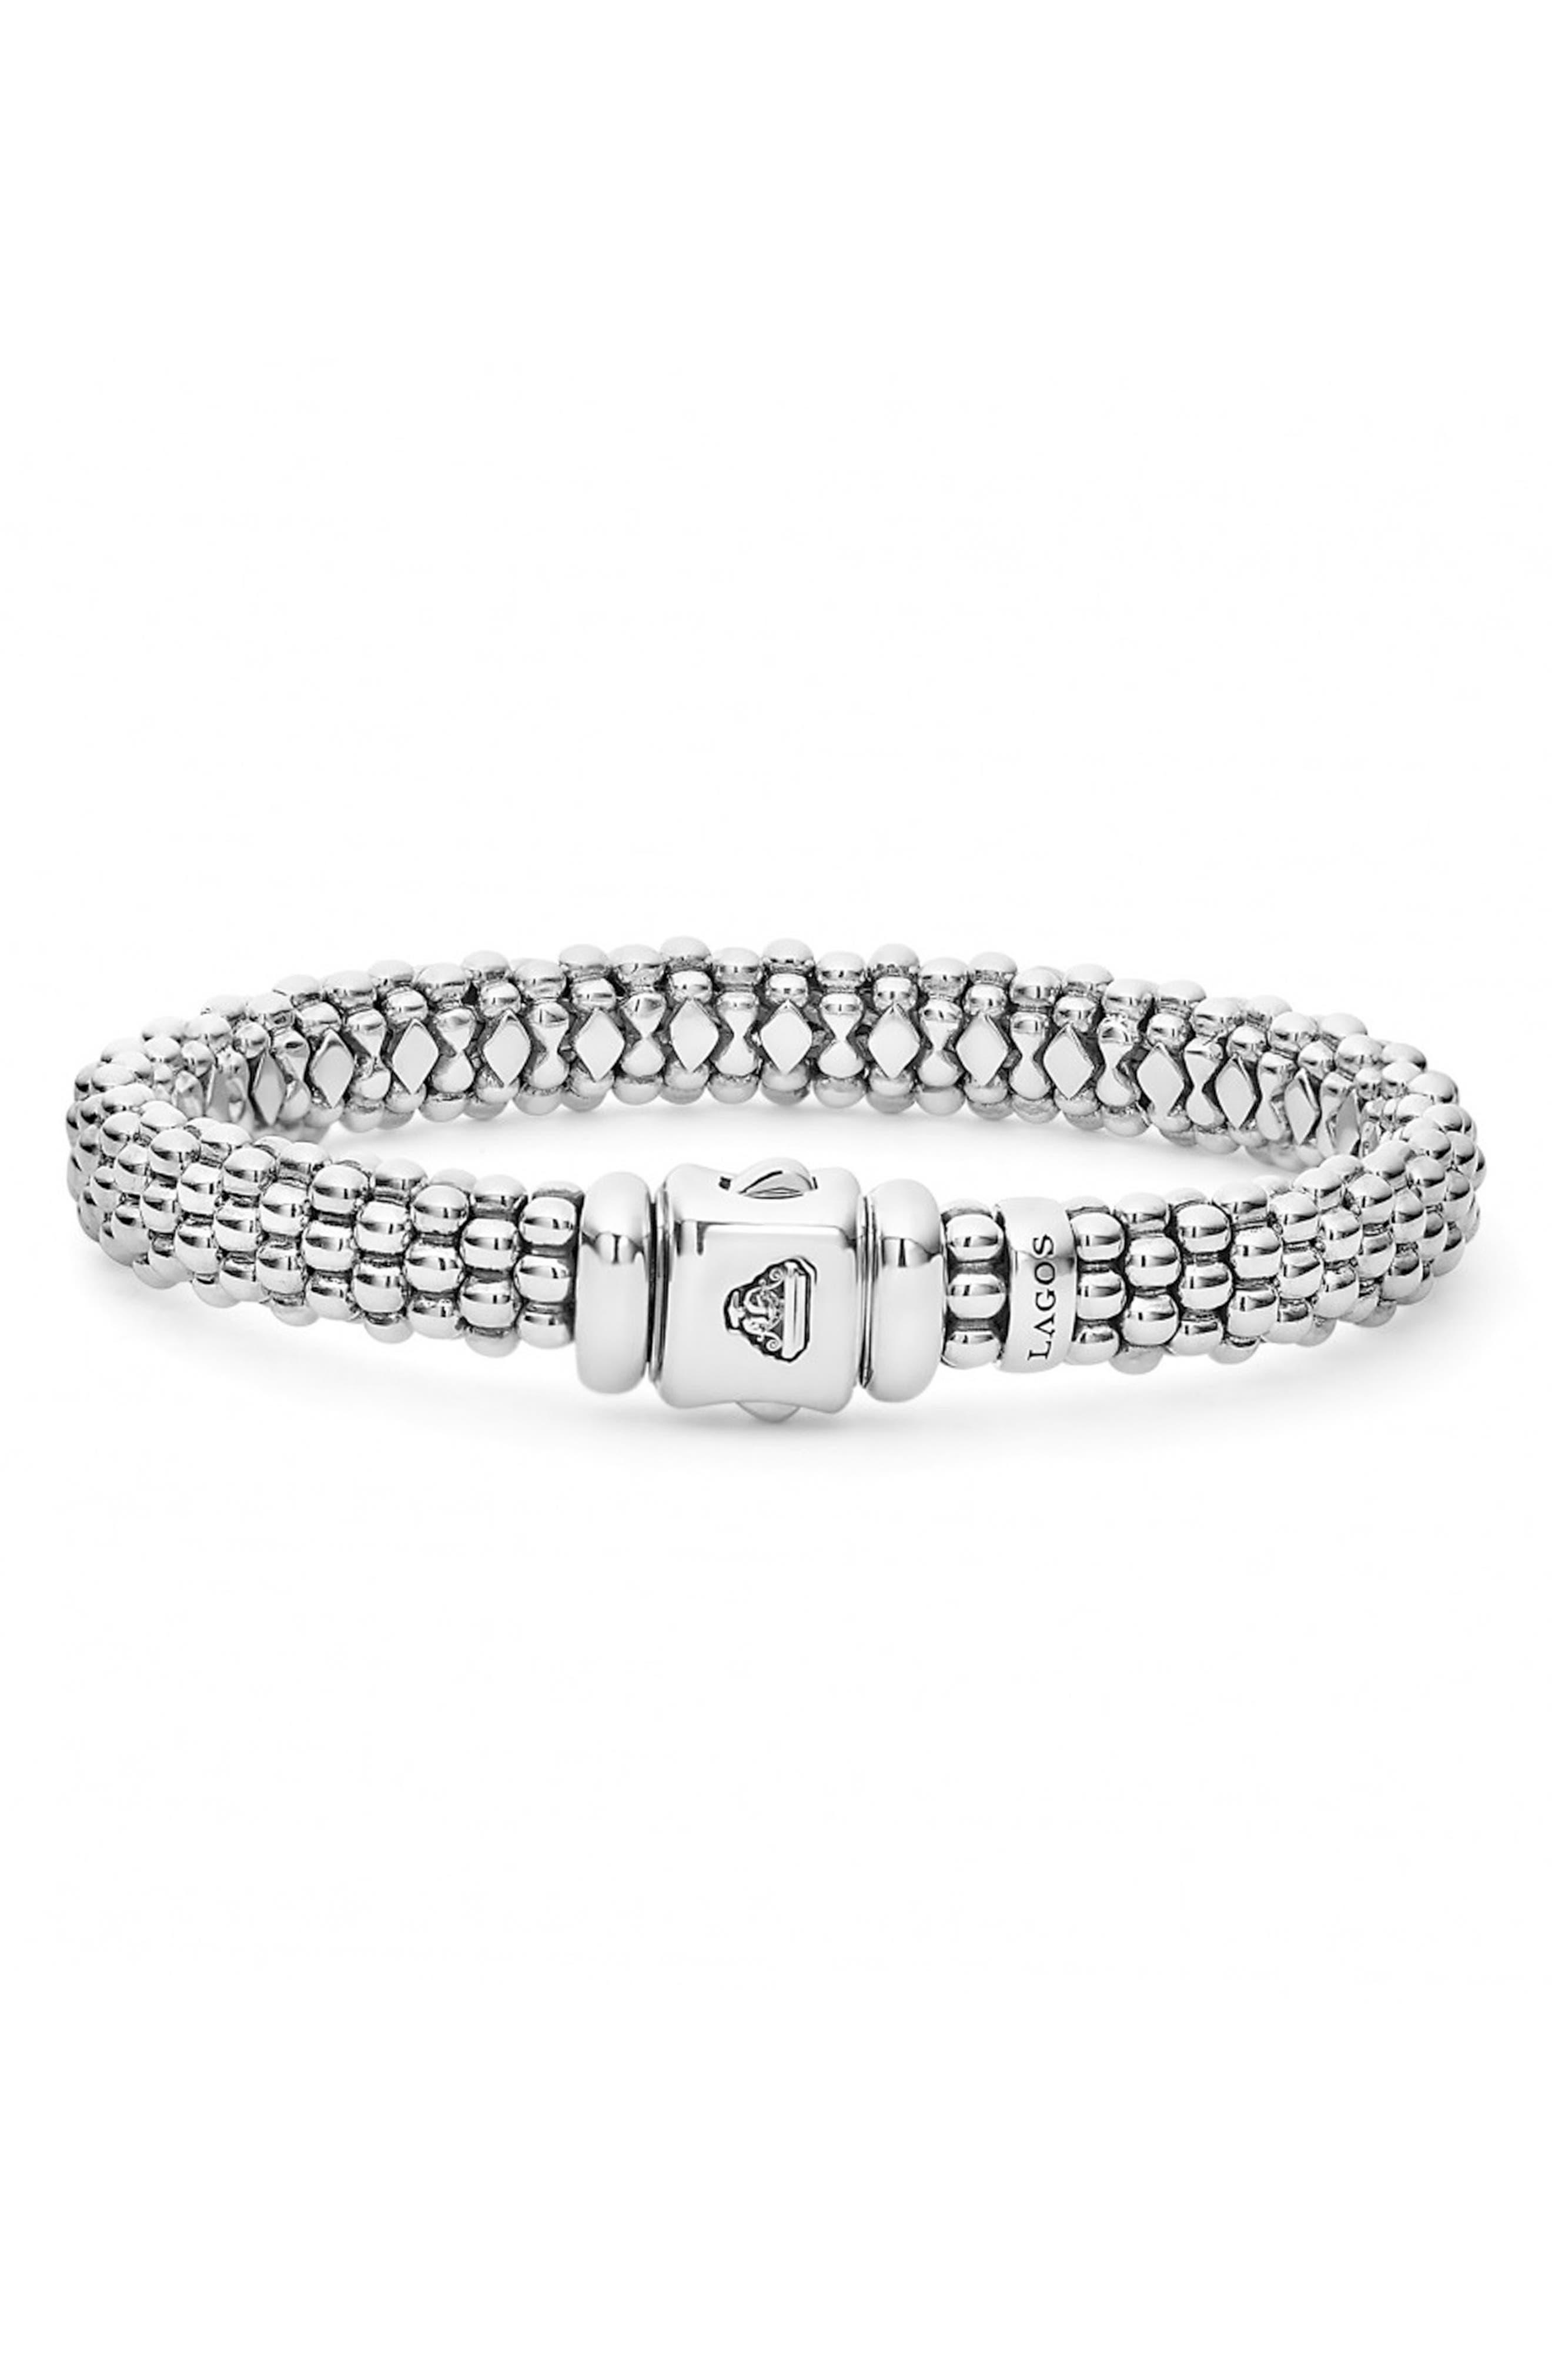 Caviar Rope Bracelet,                             Alternate thumbnail 2, color,                             Silver